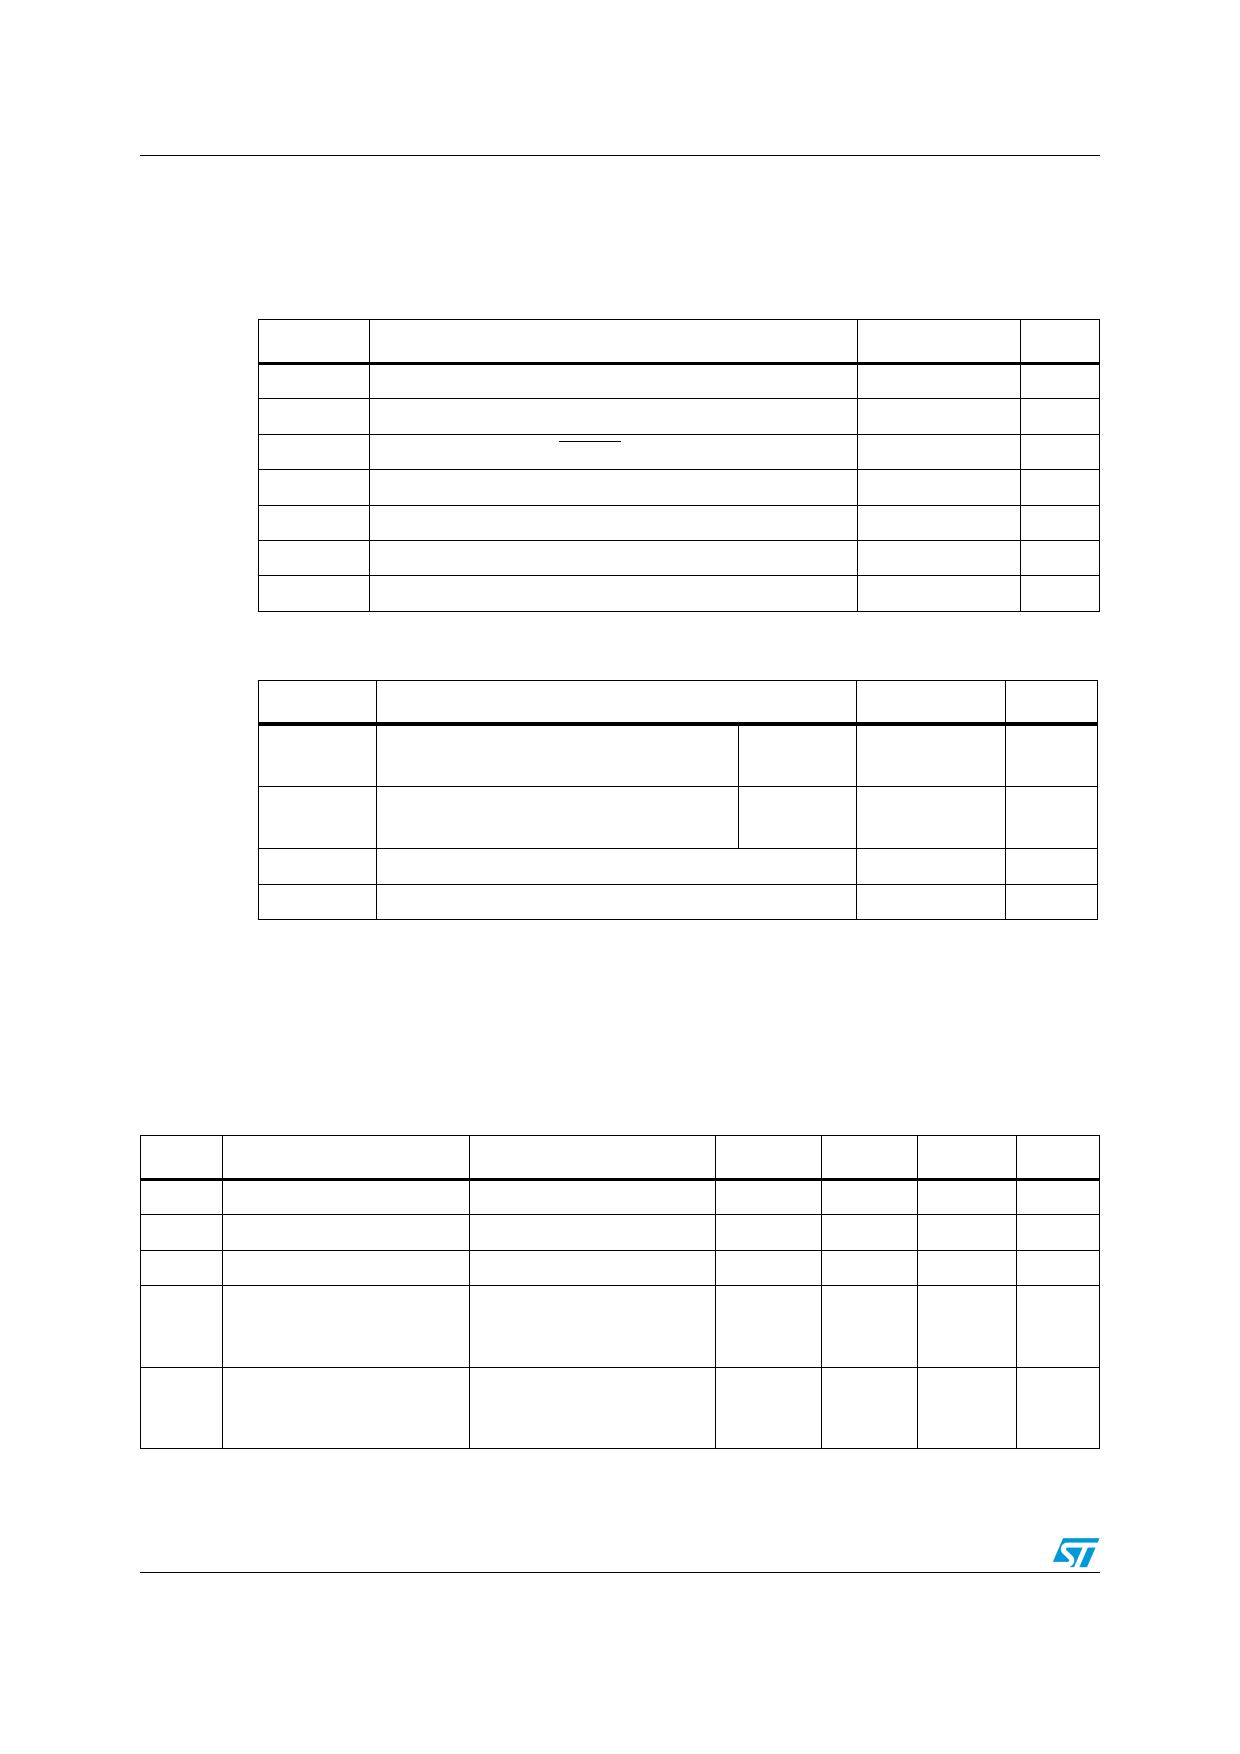 TDA8139D pdf, 반도체, 판매, 대치품